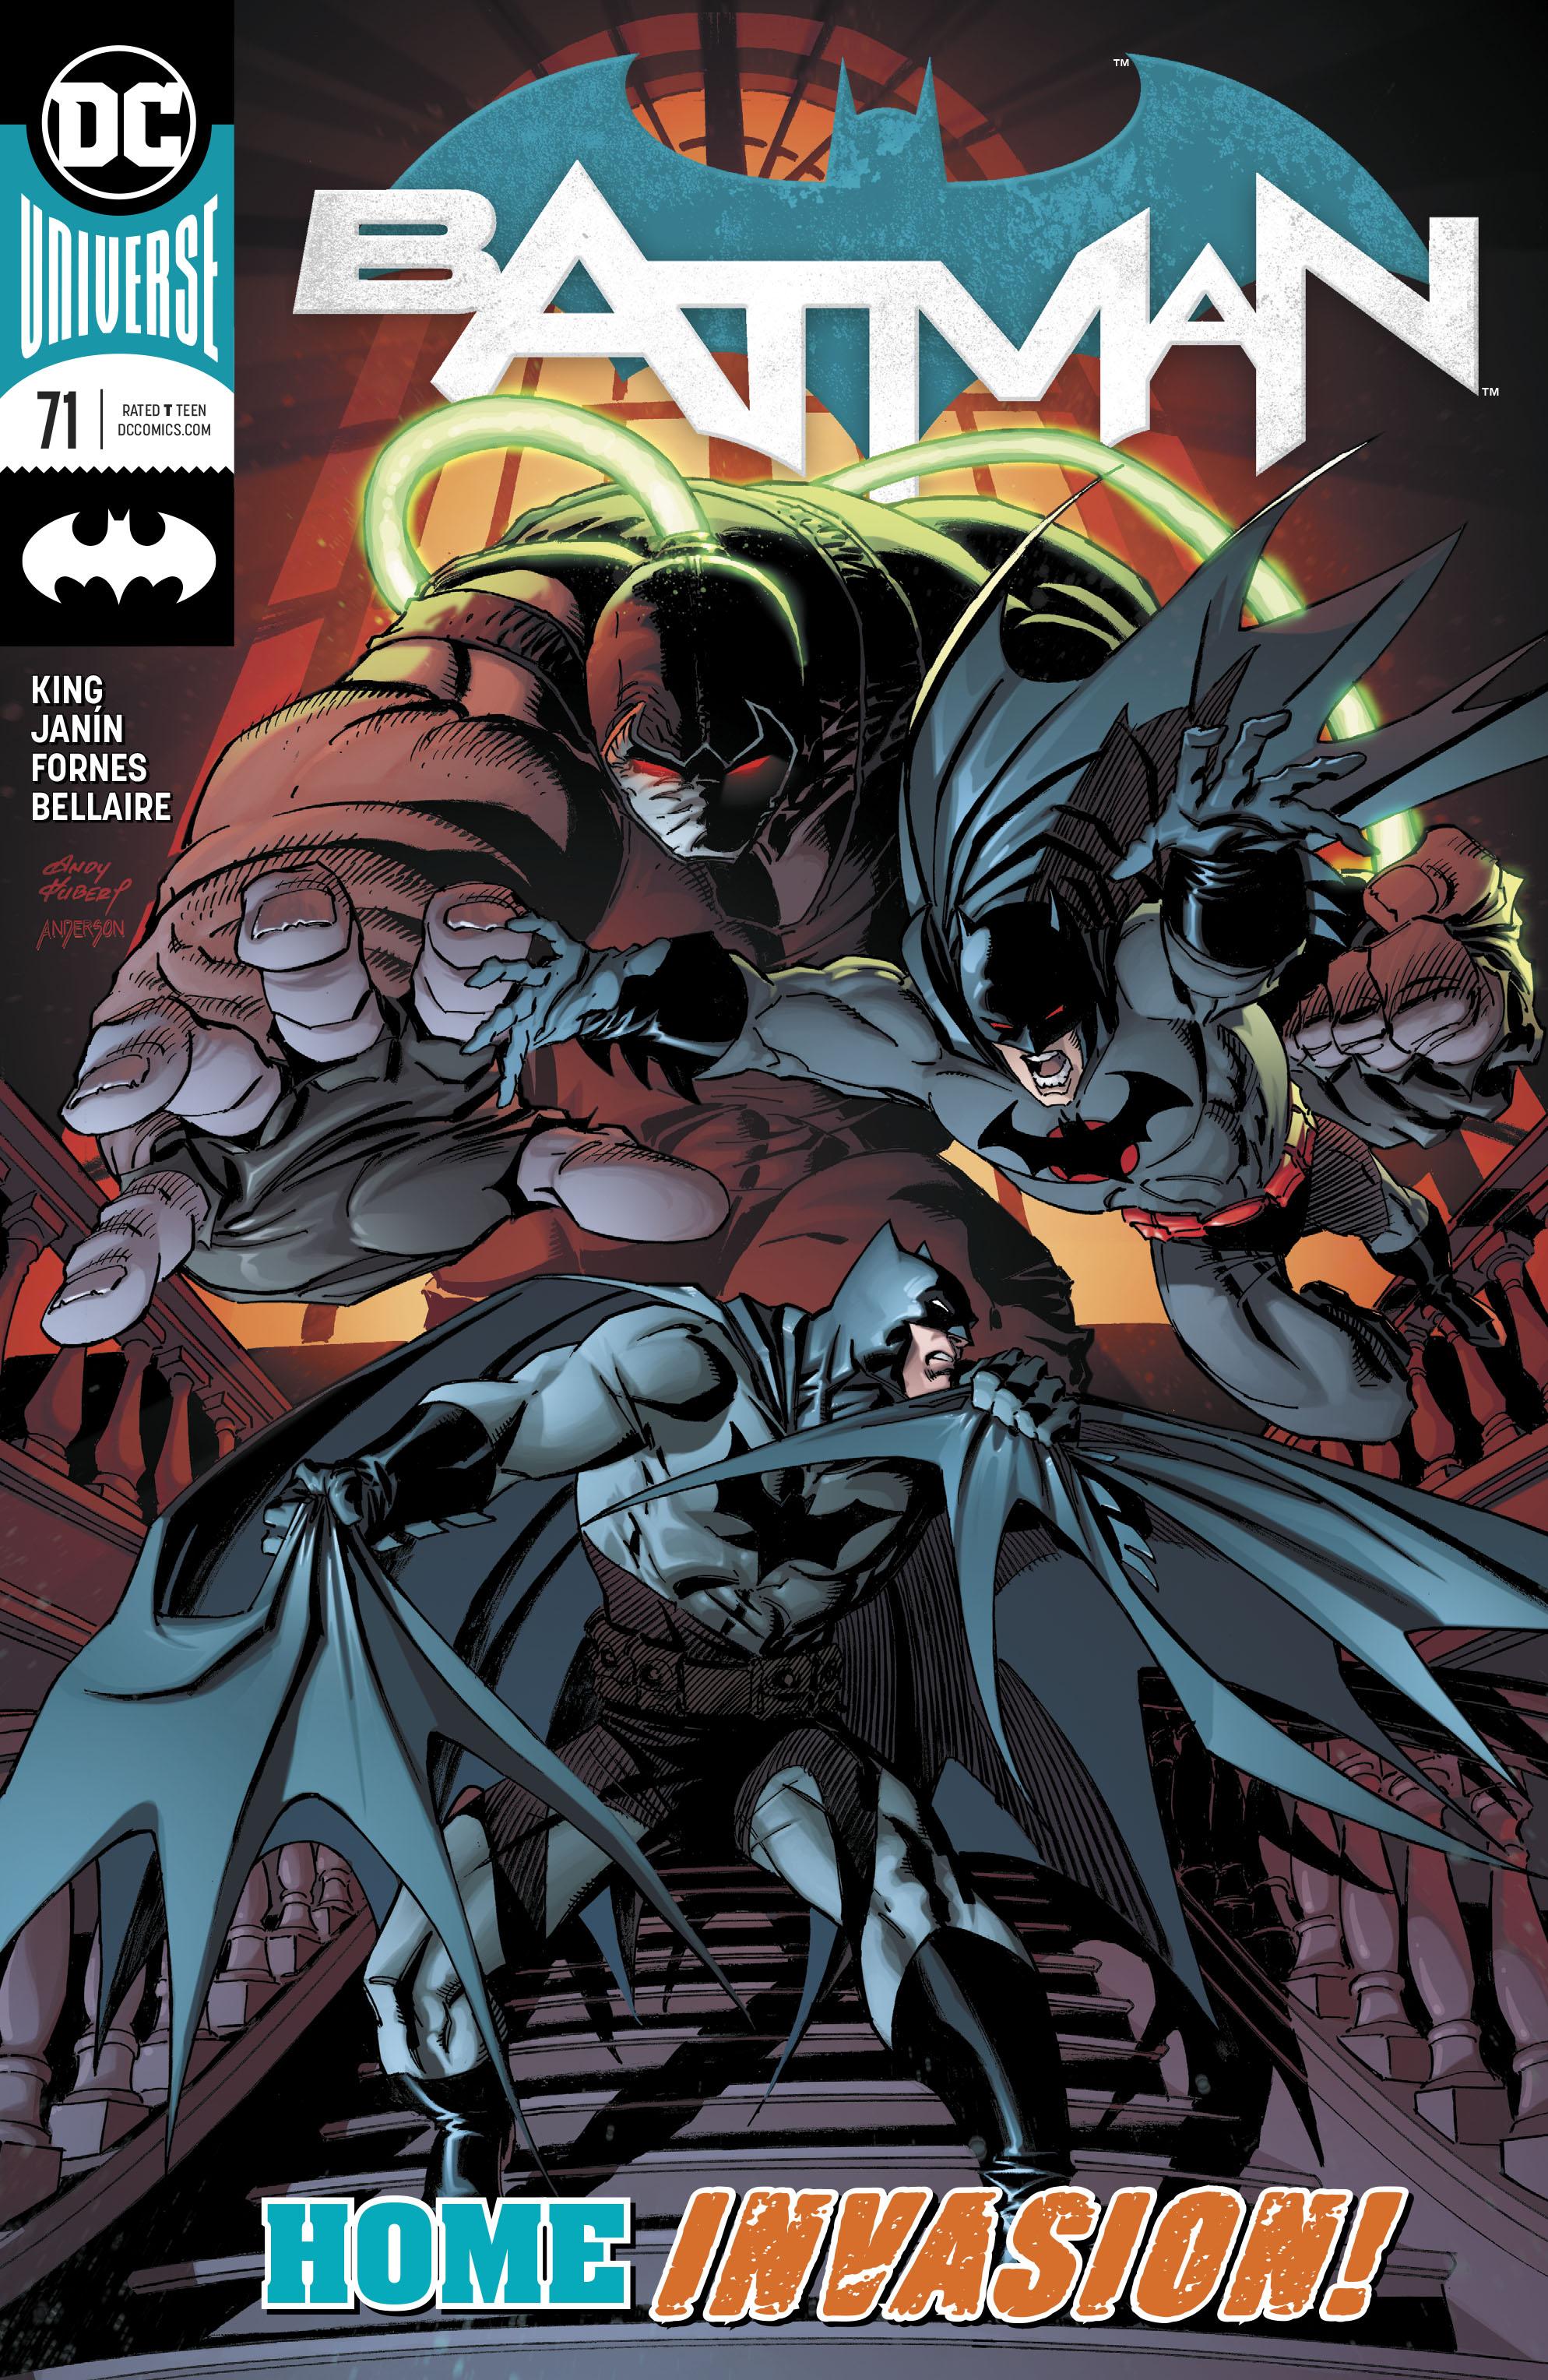 Batman (2016-): Chapter 71 - Page 1